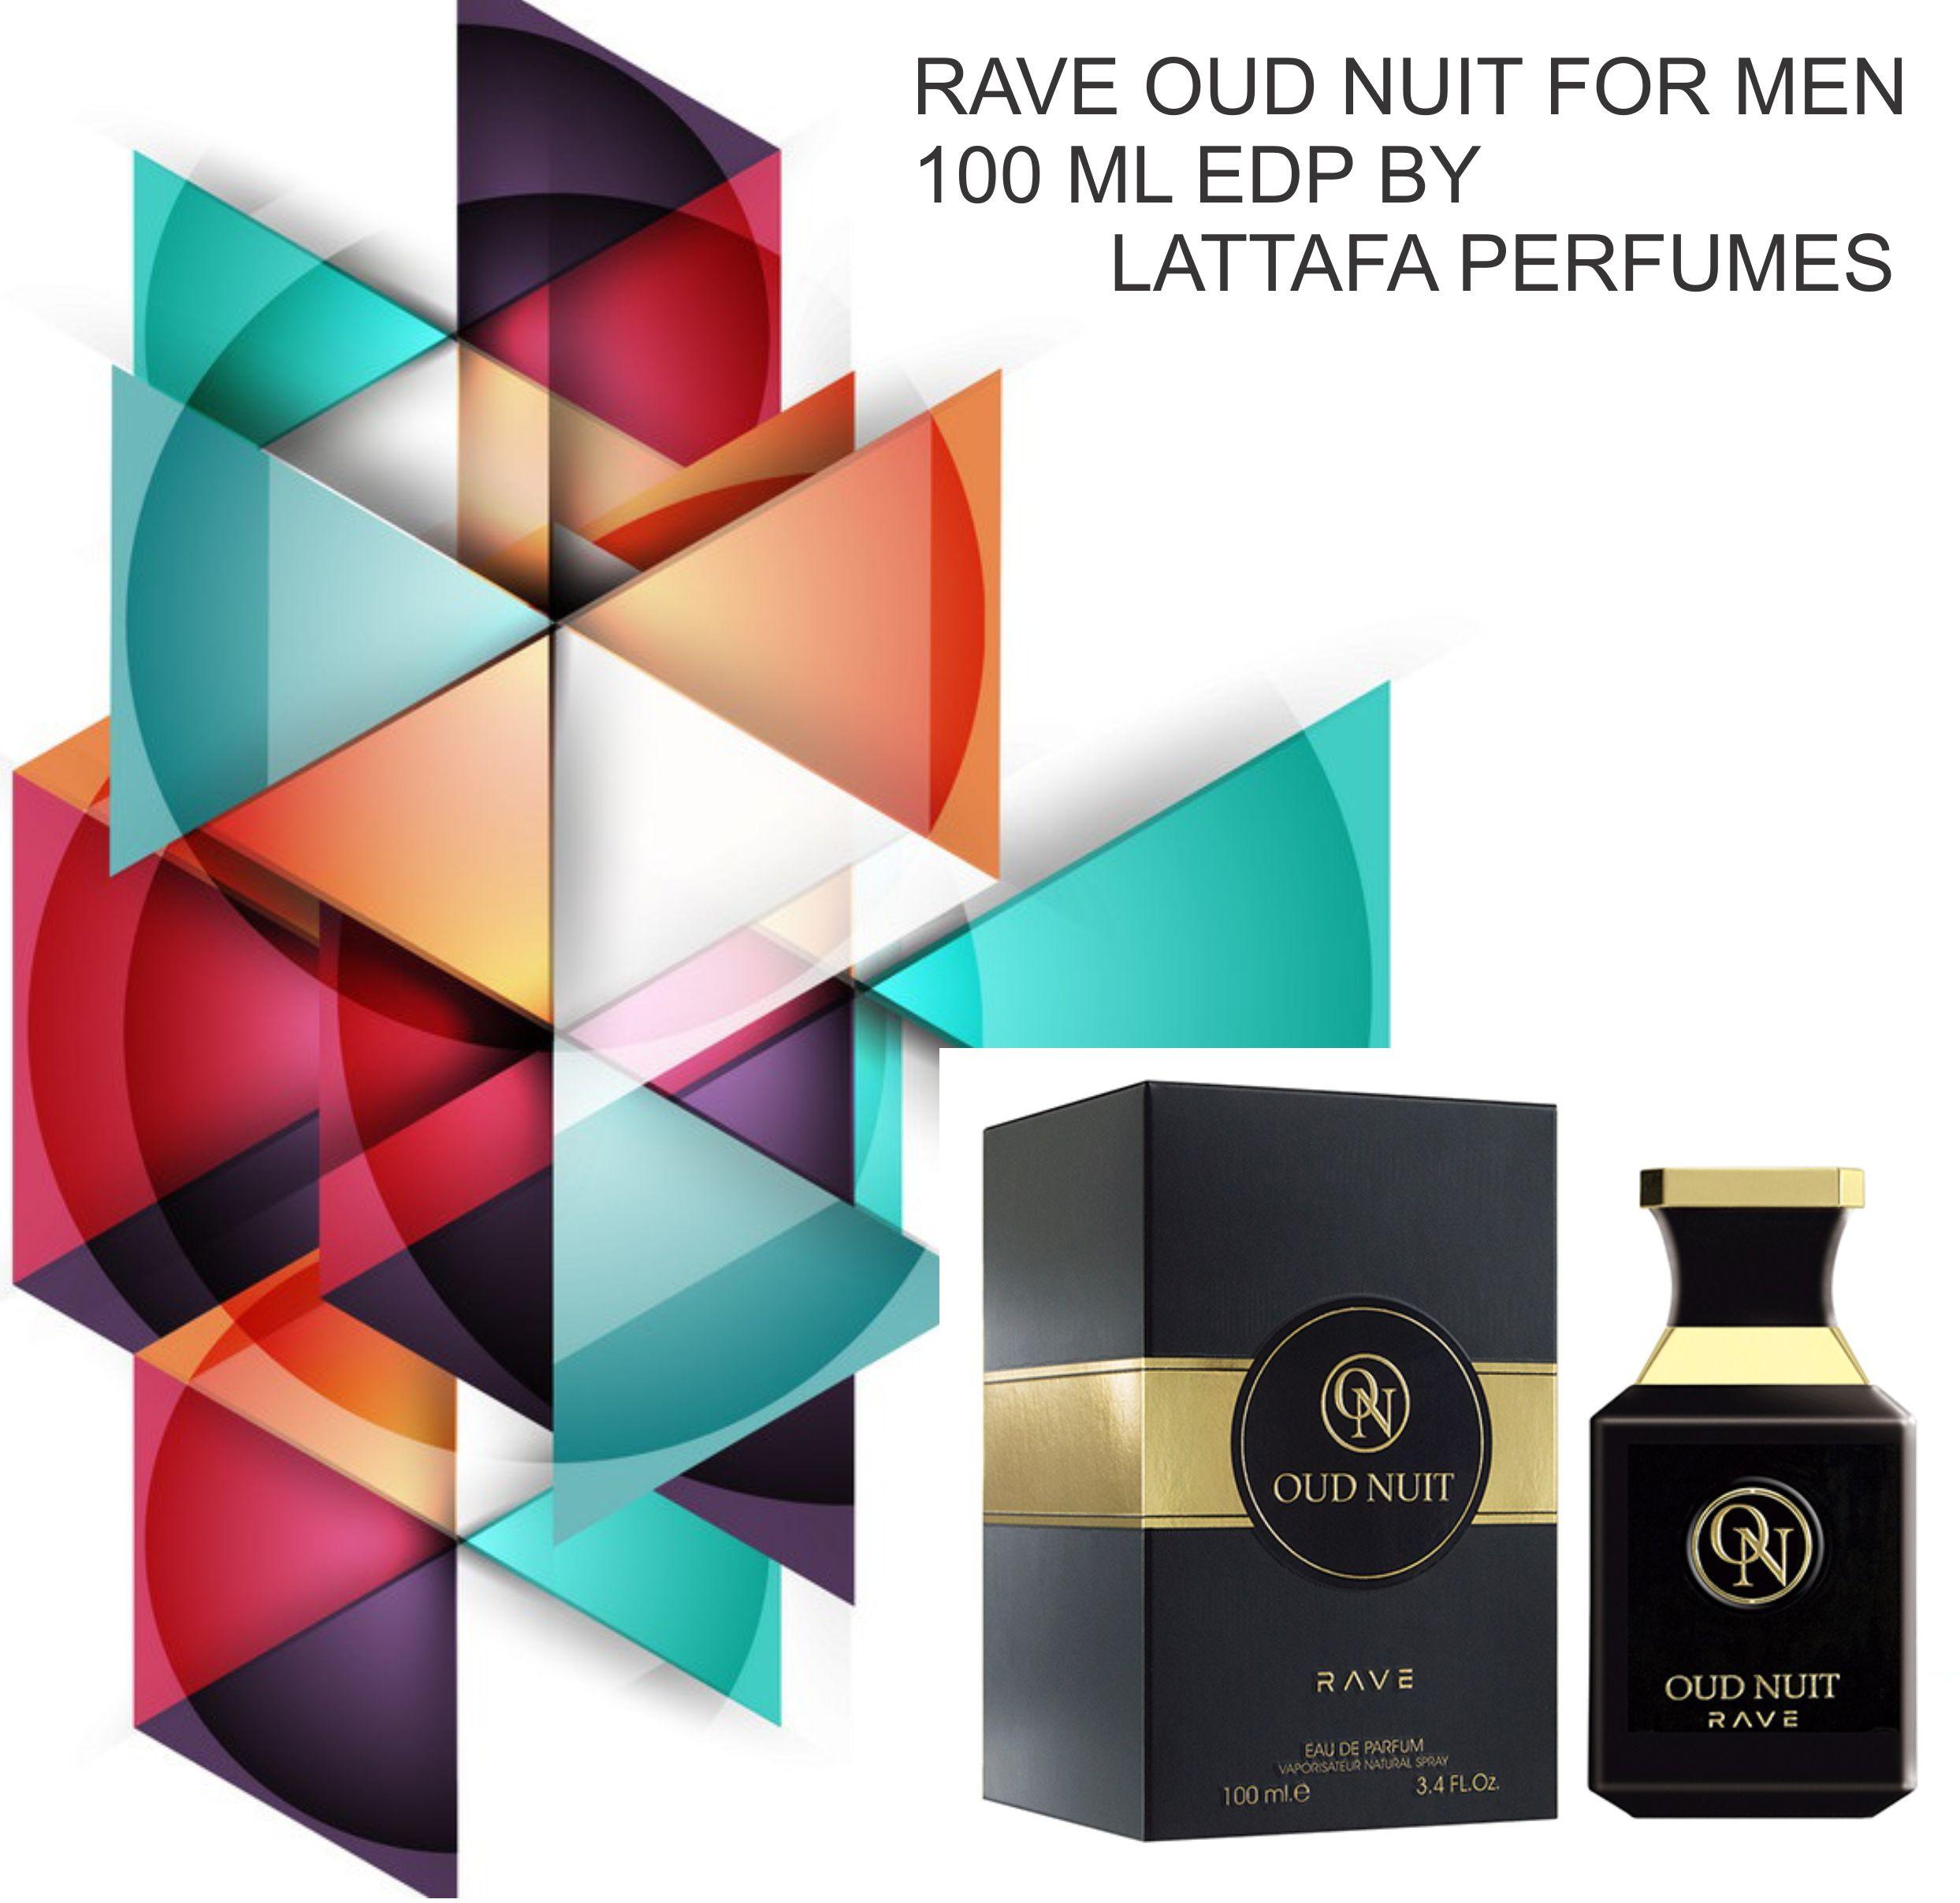 rave-oud-nuit-for-men-100-ml-edp-by-lattafa-perfumes